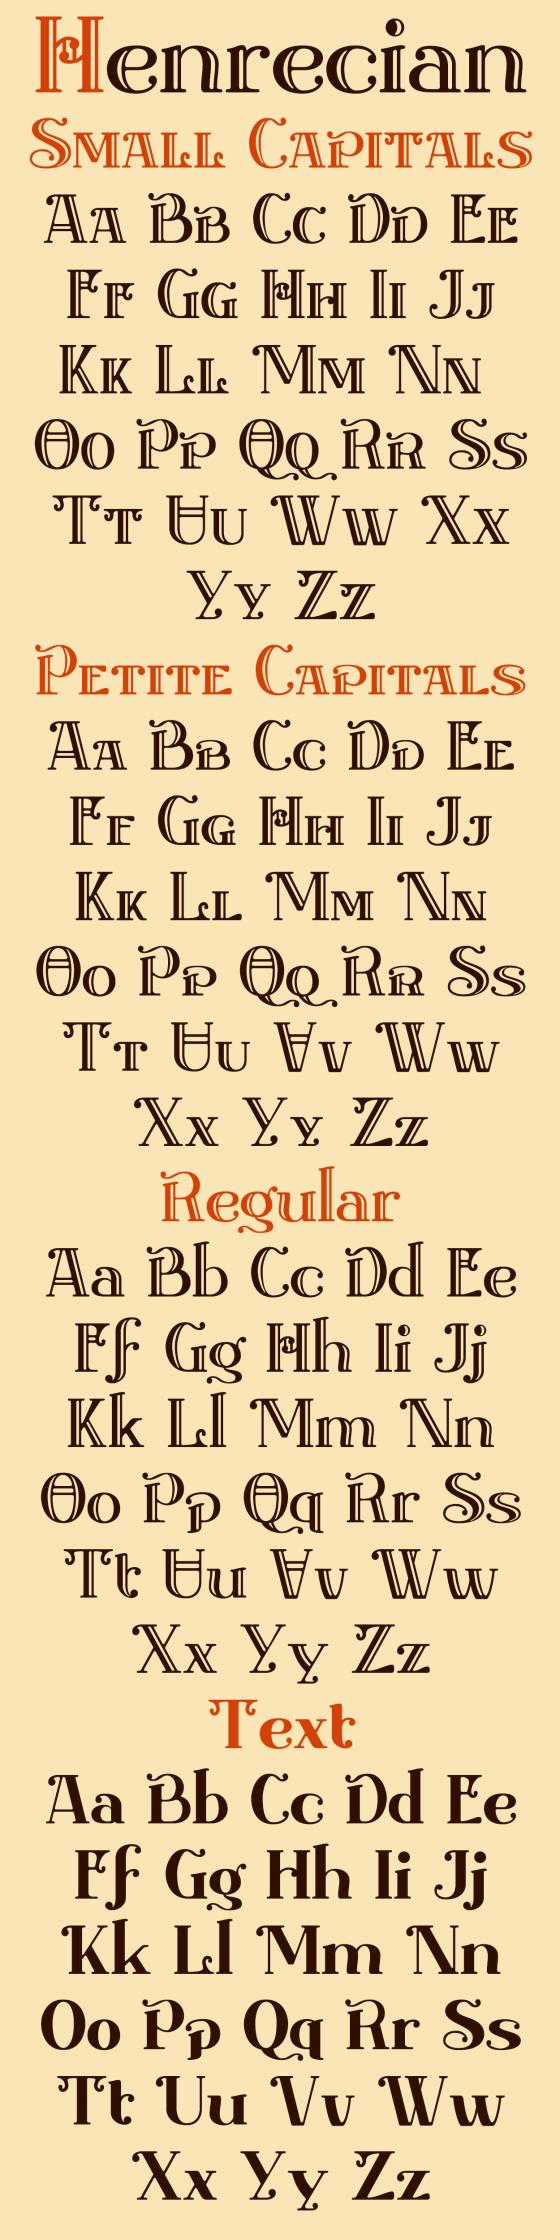 Henrecian Alphabet